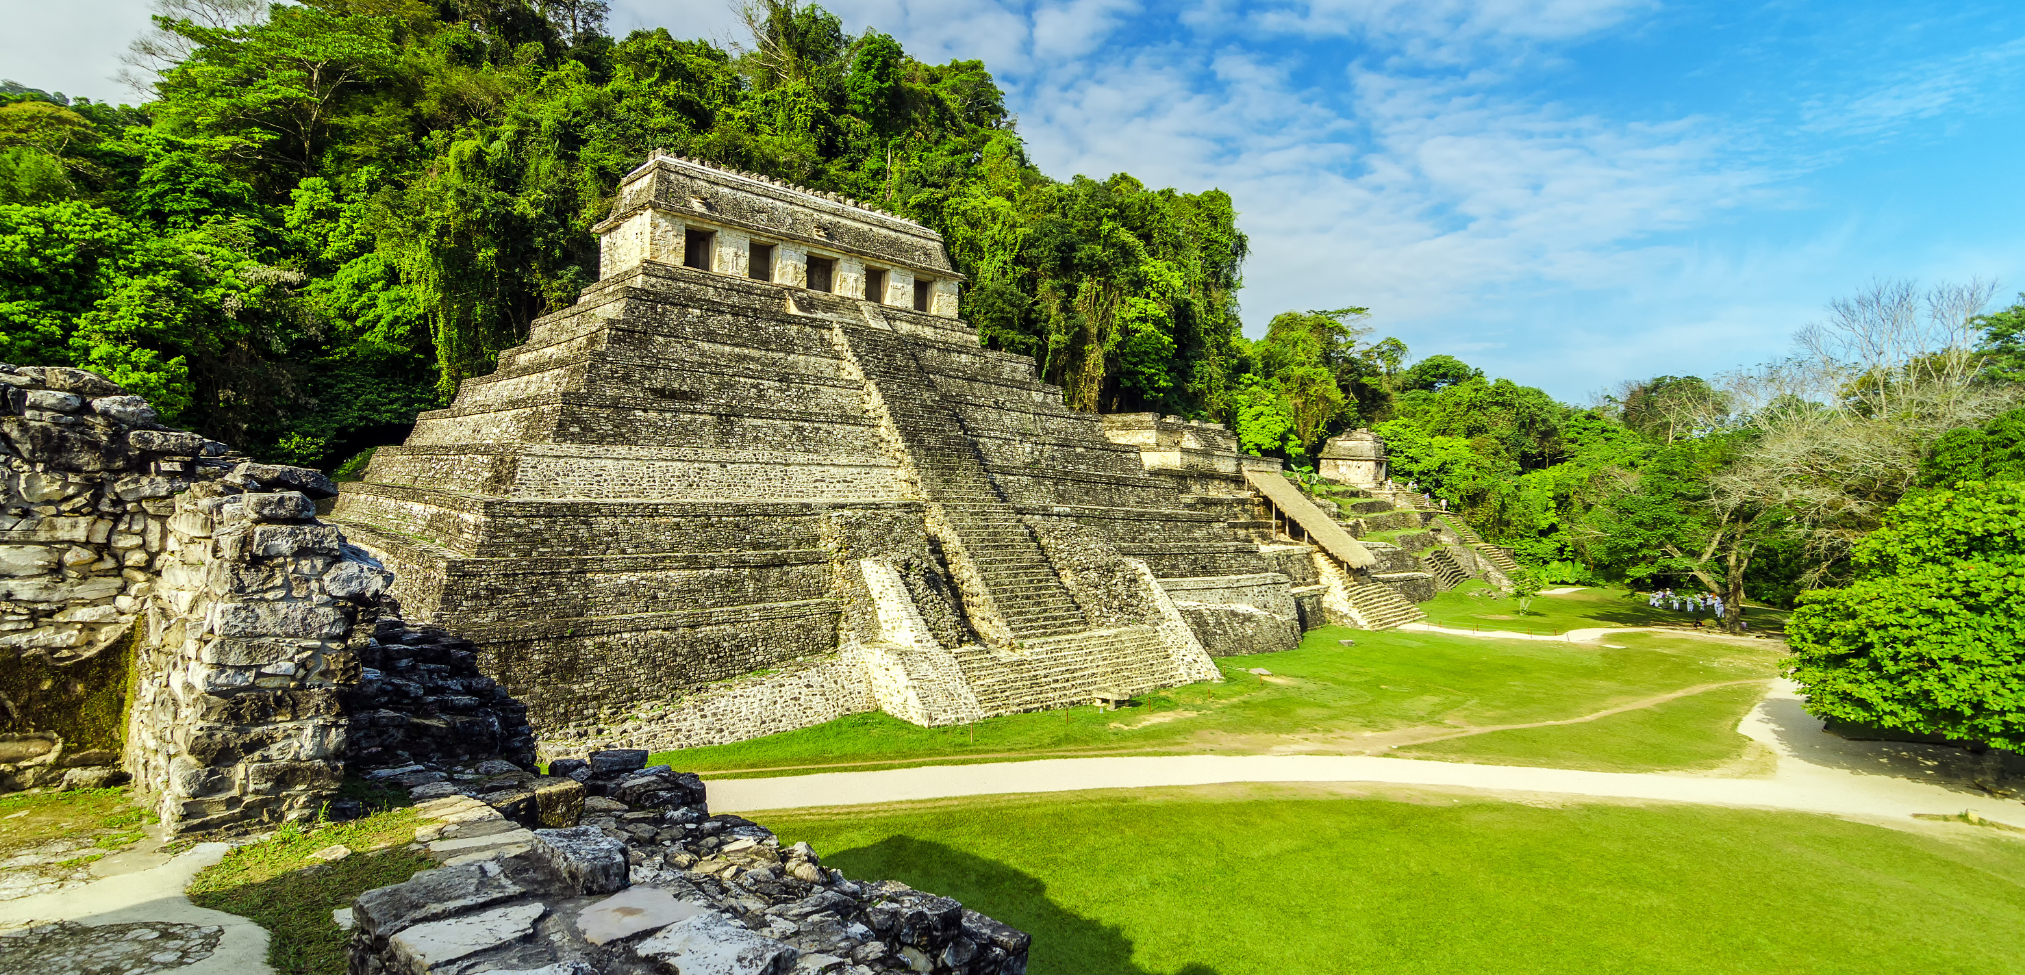 Maya Ruinen in Mexiko: Palenque